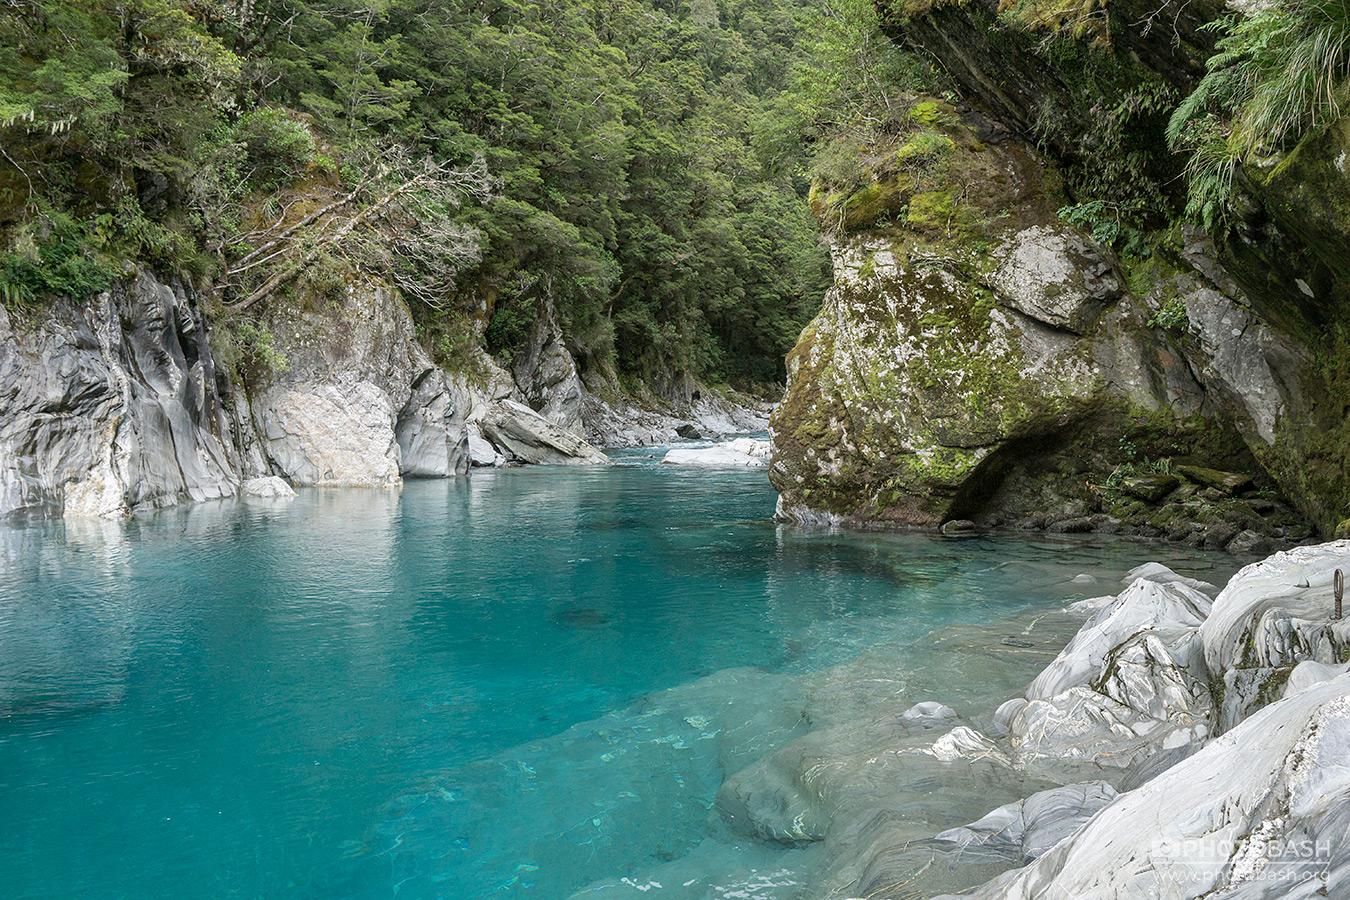 Turquoise-River-Blue-Cyan-Pools.jpg